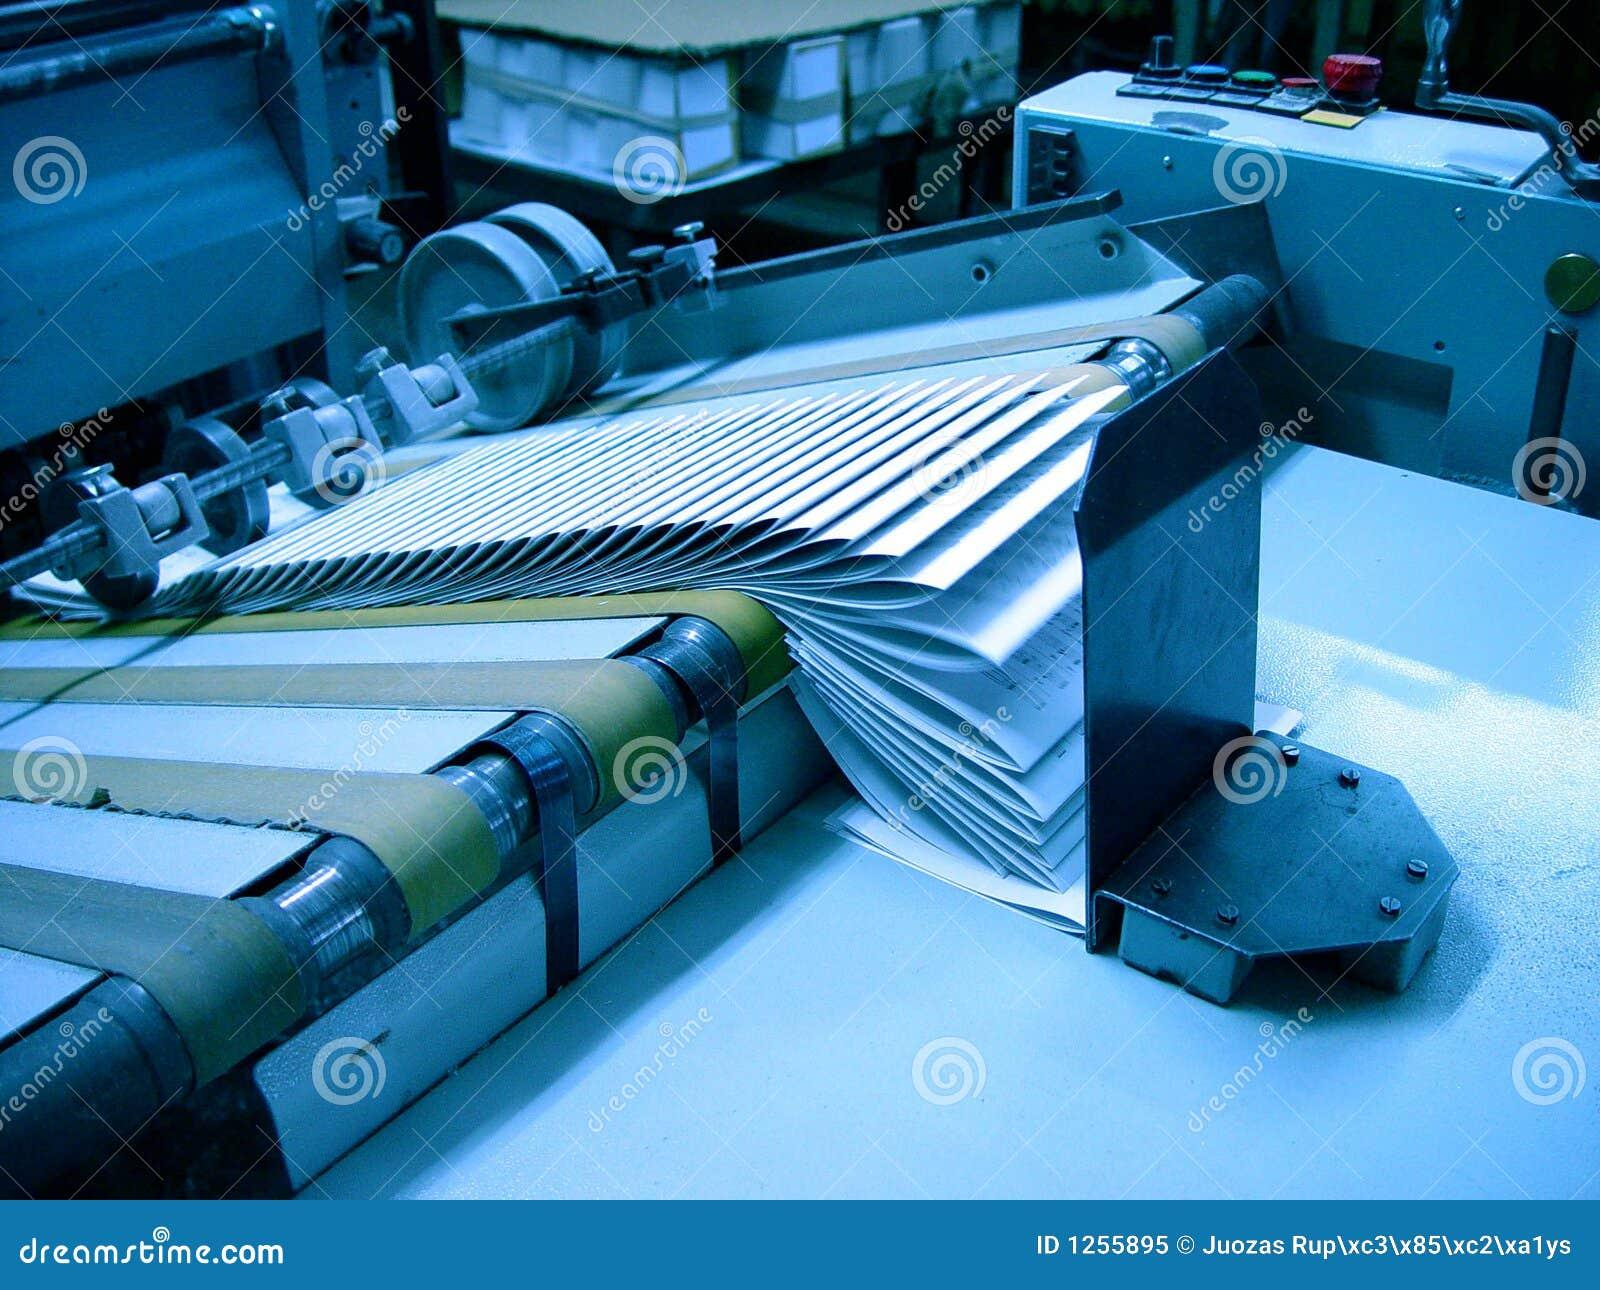 printing press 1255895